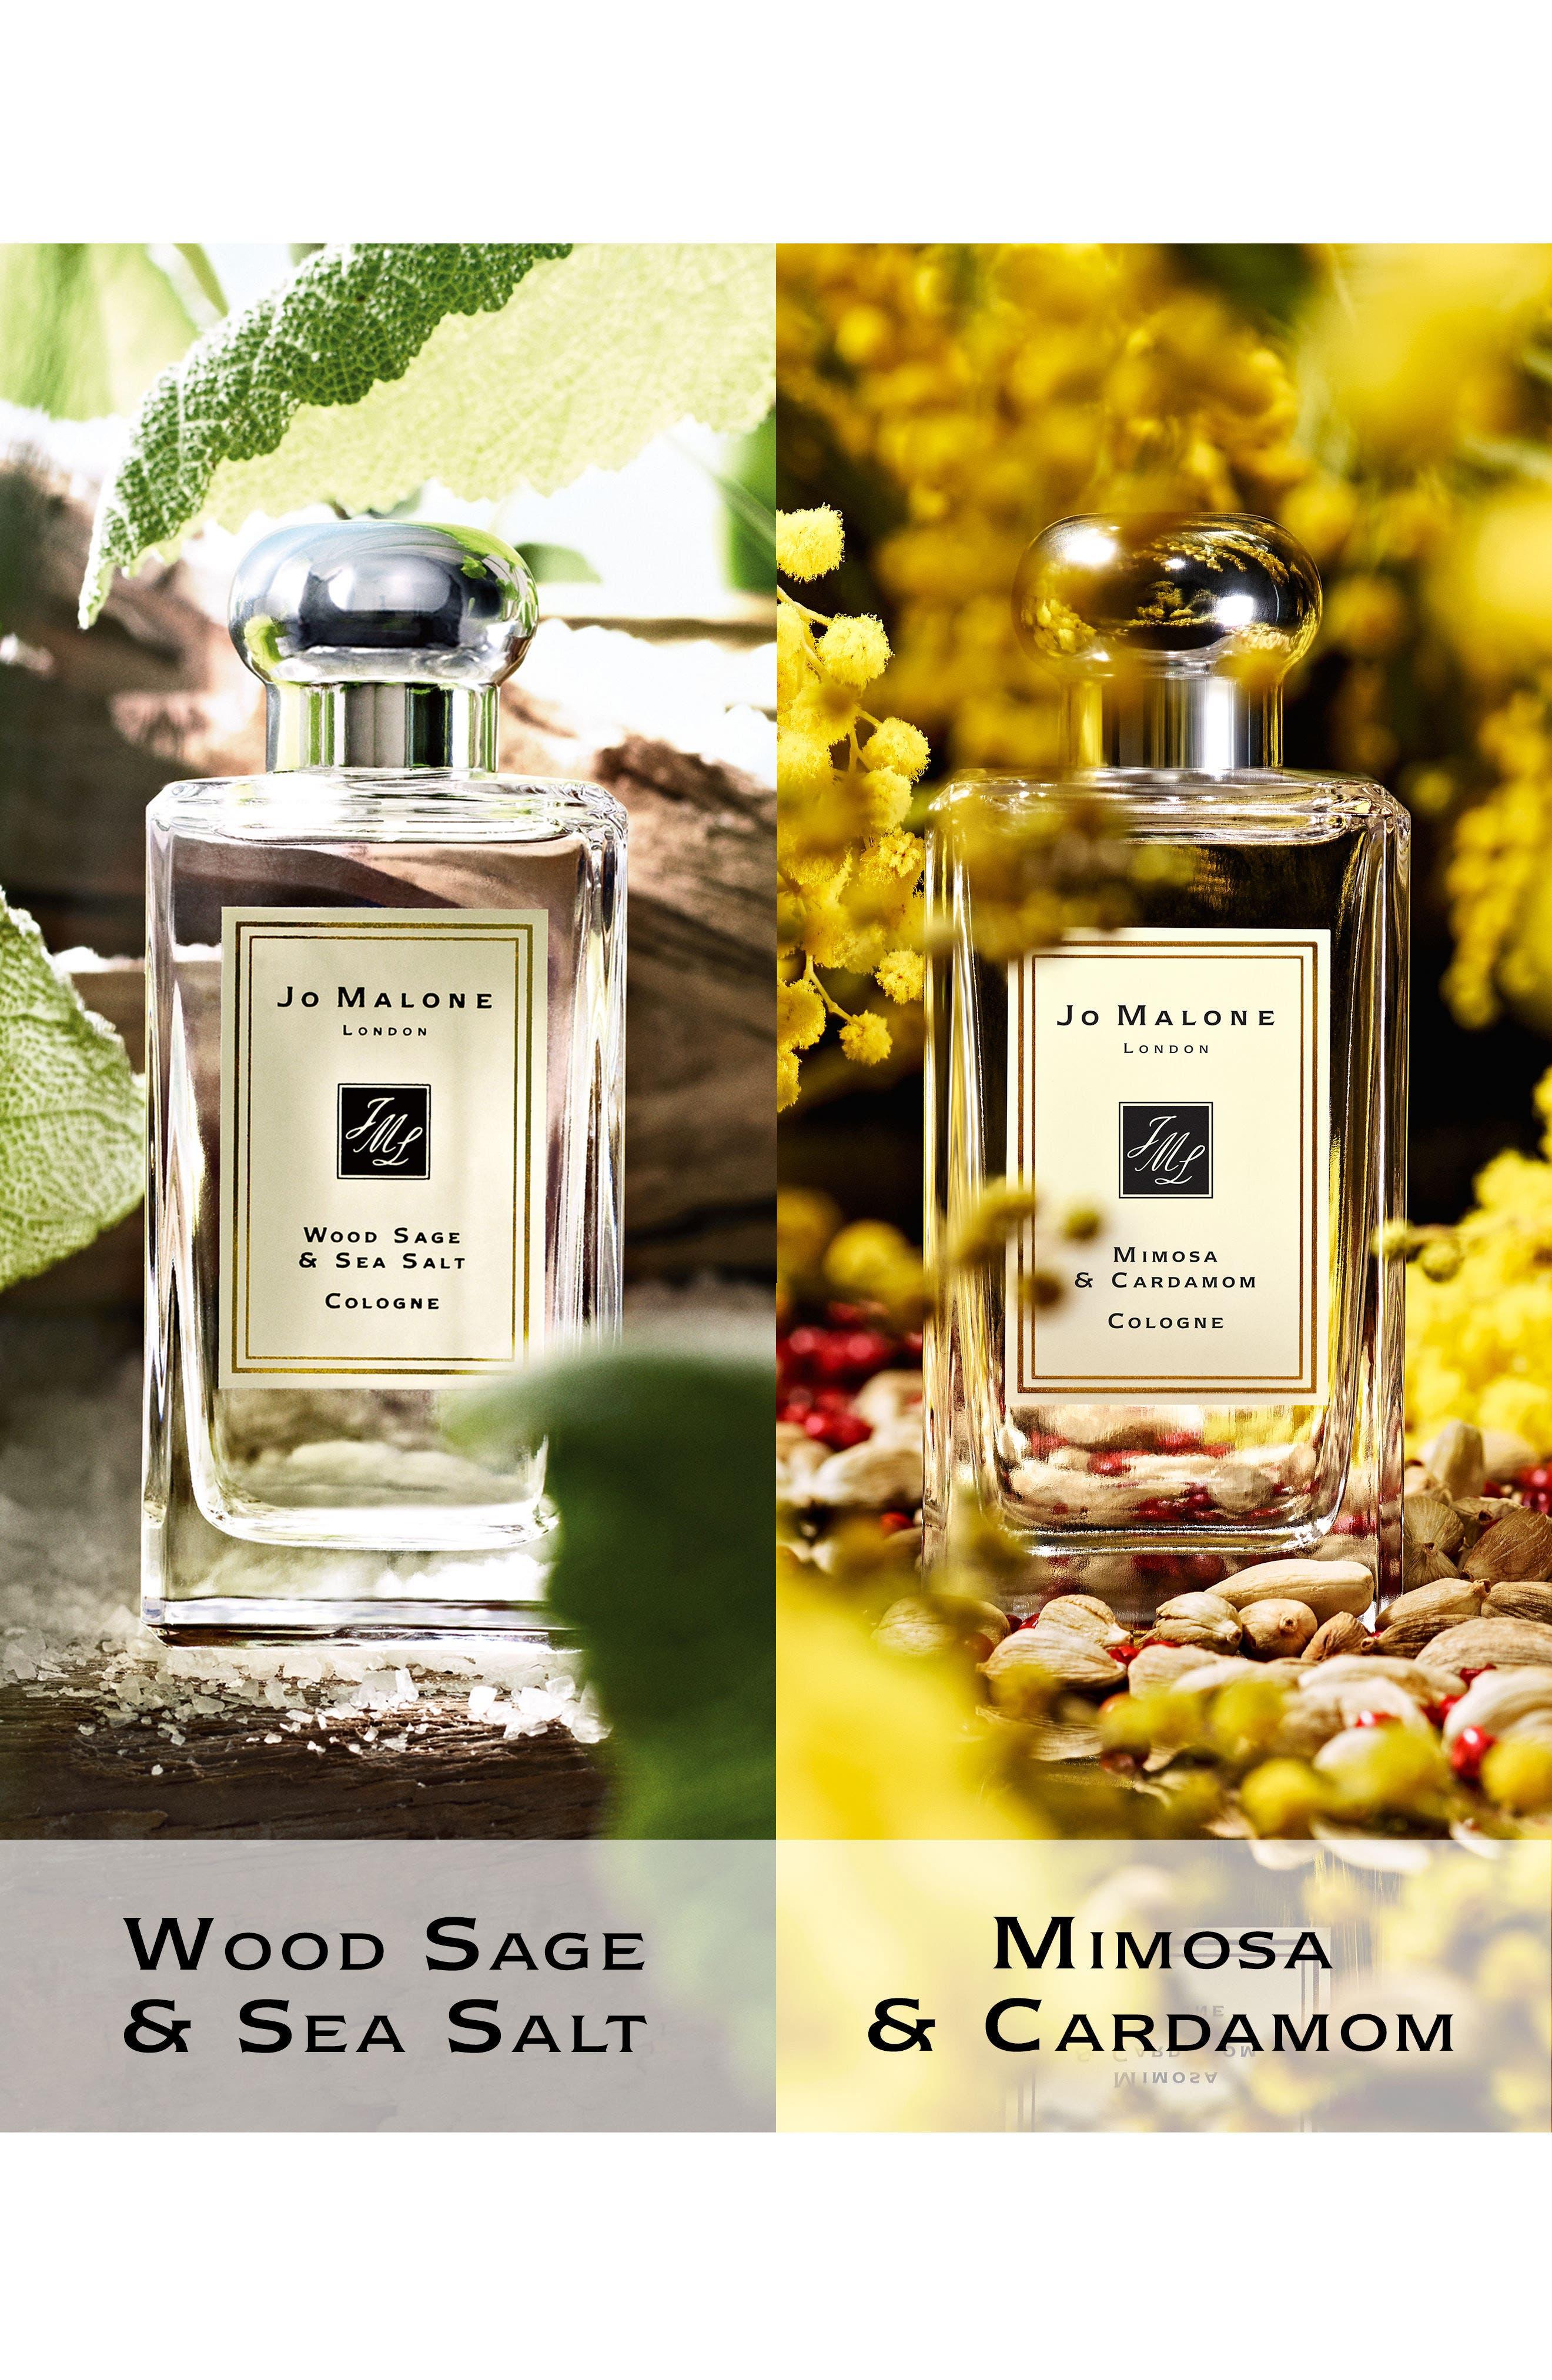 Jo Malone London™ Mimosa & Cardamom & Wood Sage & Sea Salt